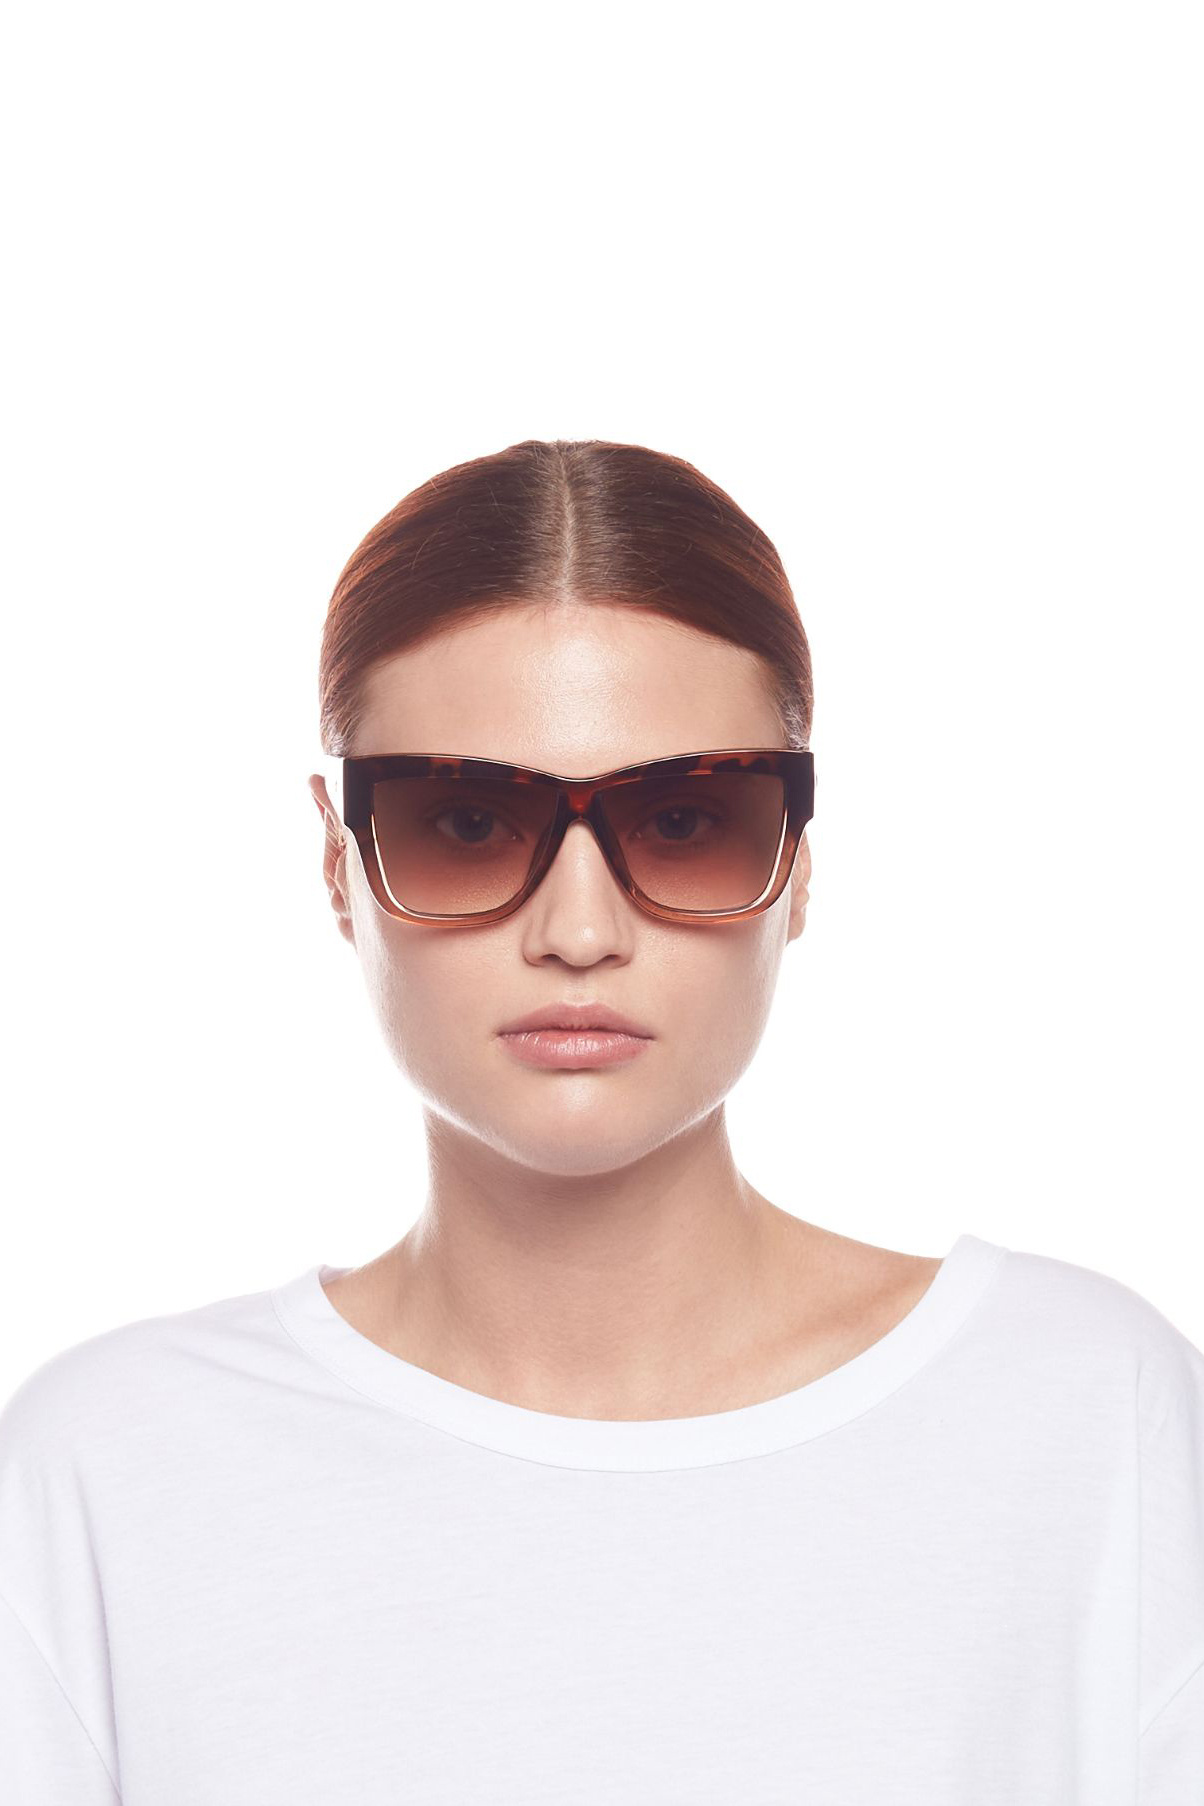 Total Eclipse Sunglasses - Tortoise Tan-2